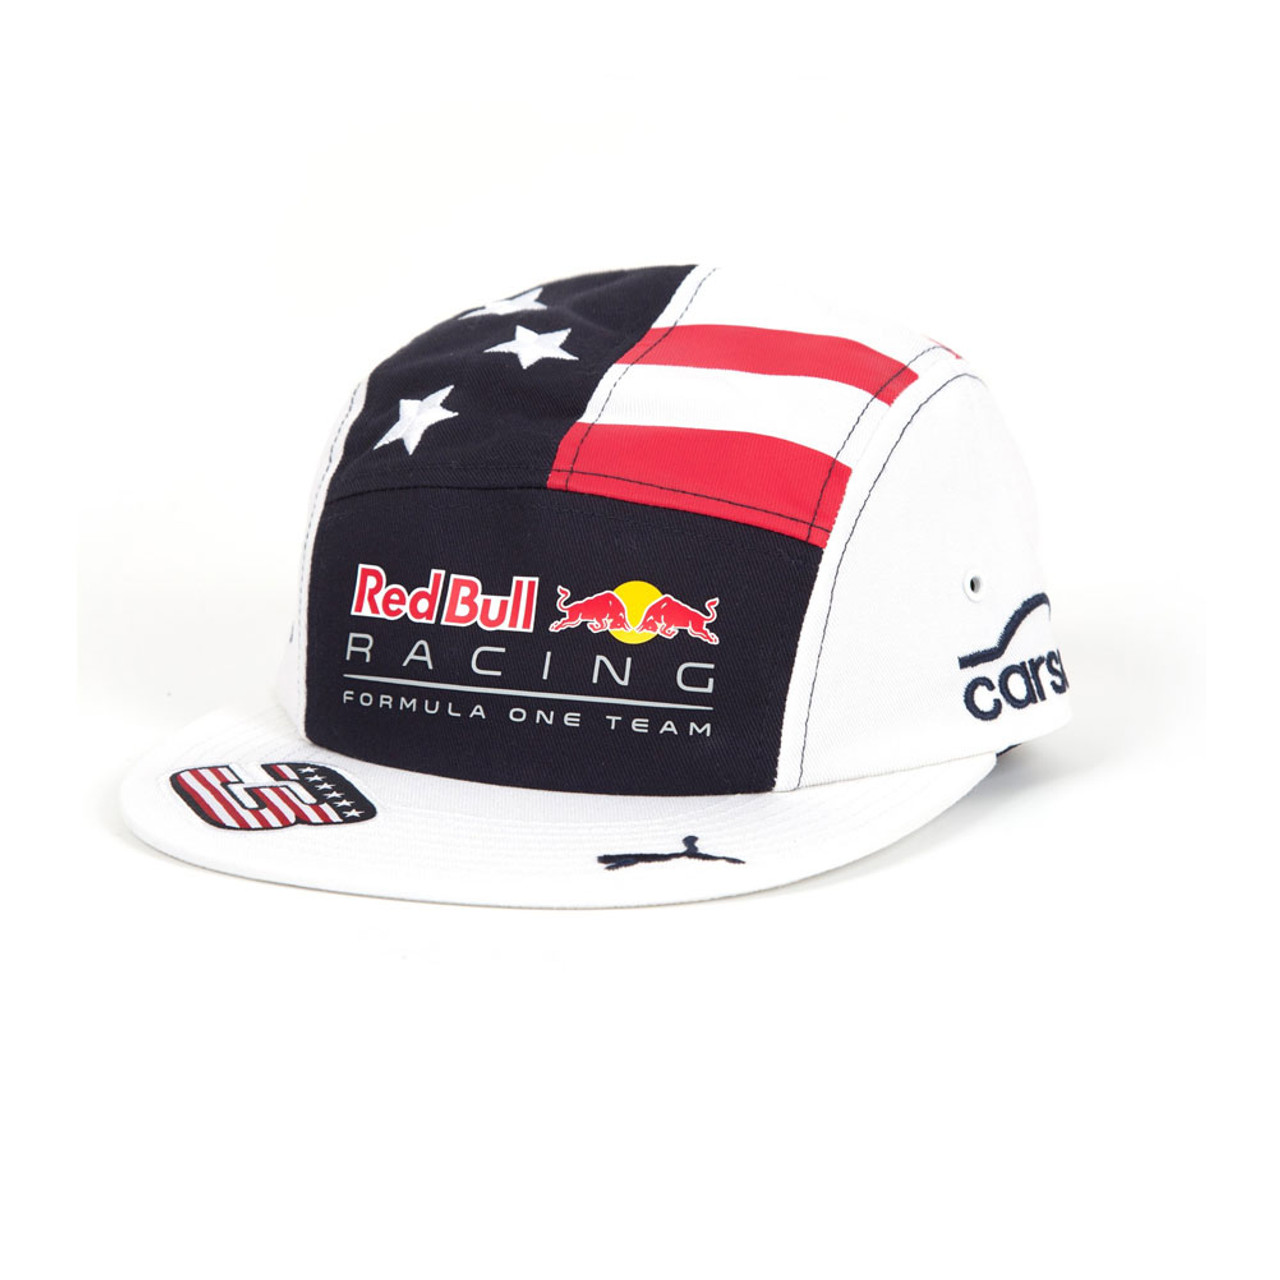 ebe134d26 PUMA red bull racing daniel ricciardo special edition cap [white]-One size  fits all